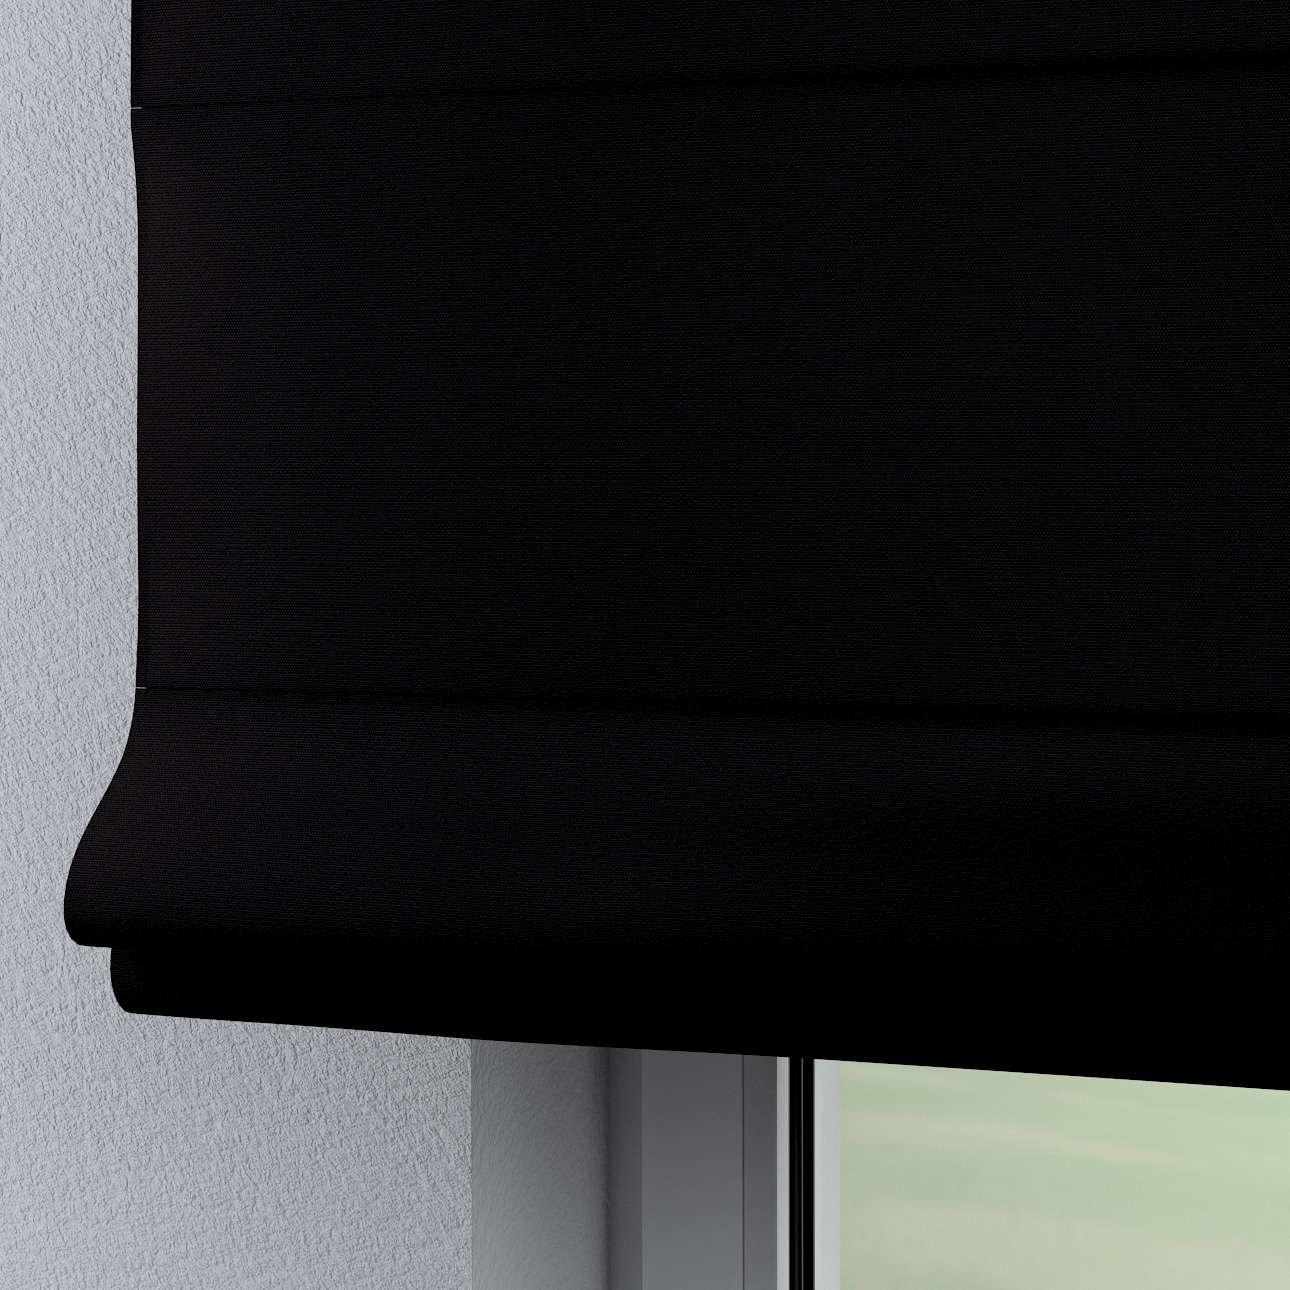 Hissgardin Verona 80 x 170 cm i kollektionen Panama Cotton , Tyg: 702-09